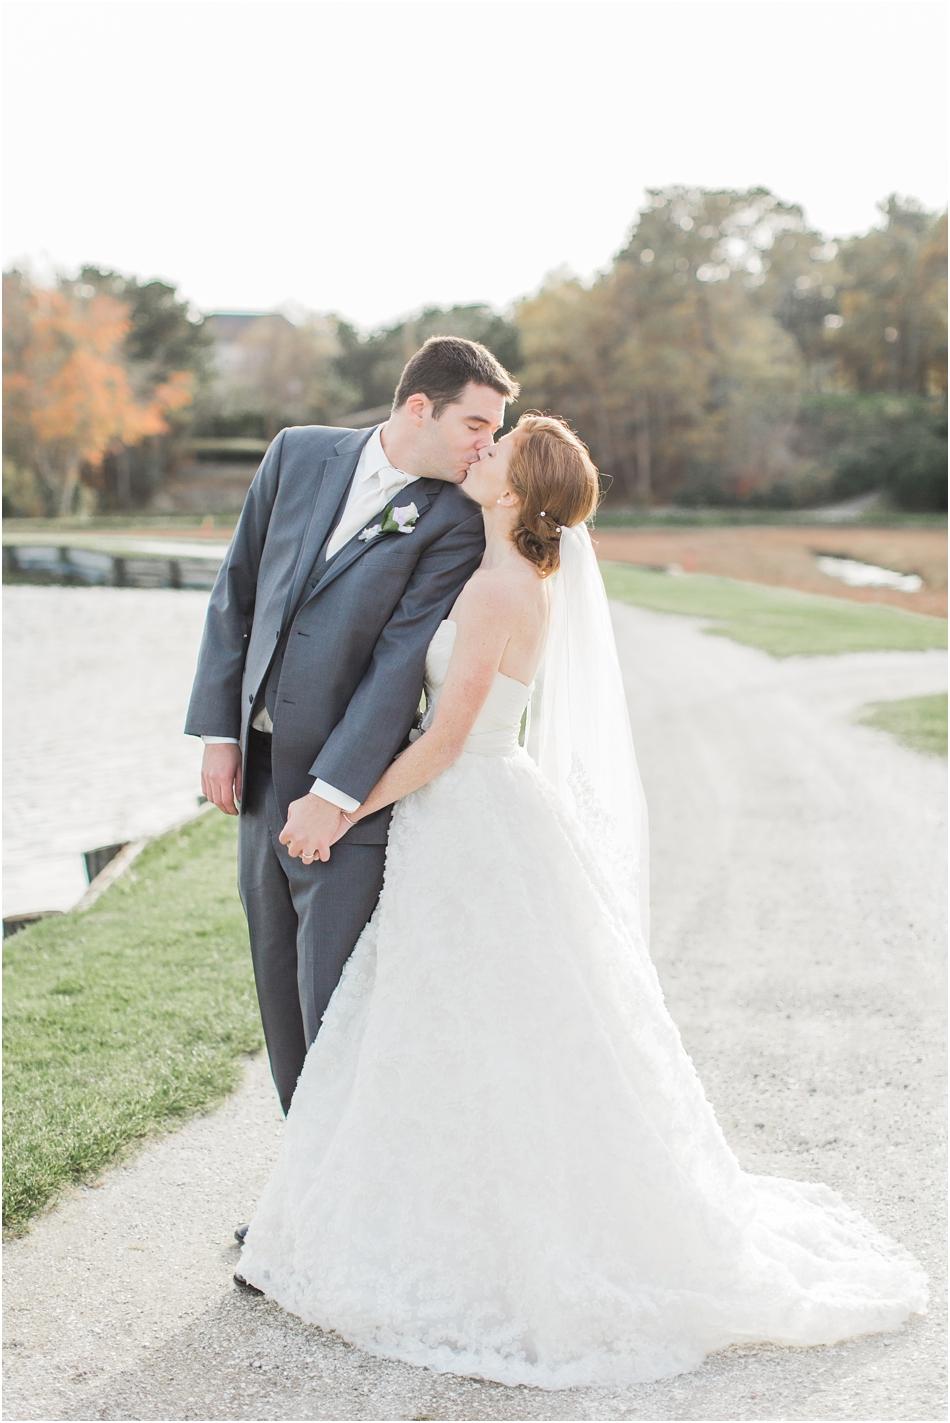 willowbend_megan_david_country_club_cape_cod_boston_new_england_wedding_photographer_Meredith_Jane_Photography_photo_0205.jpg